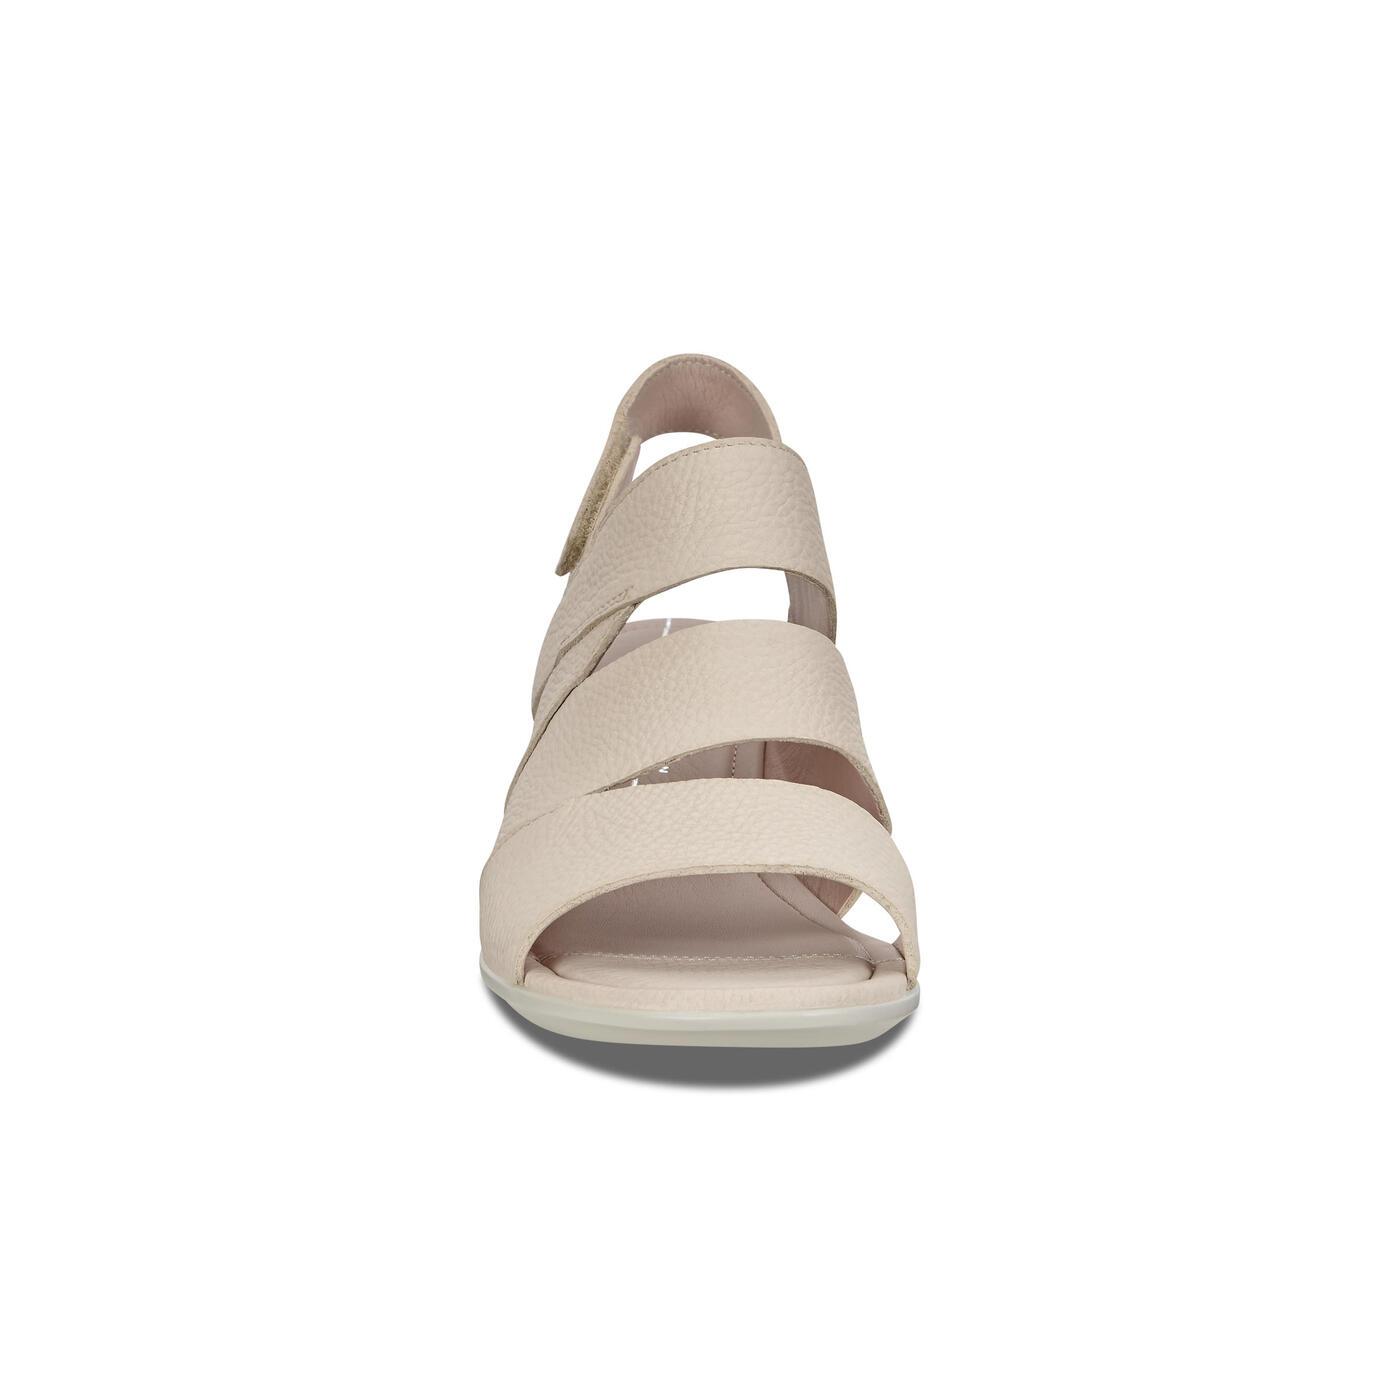 ECCO 여성 샌들 쉐이프 35 웨지 250153-01281